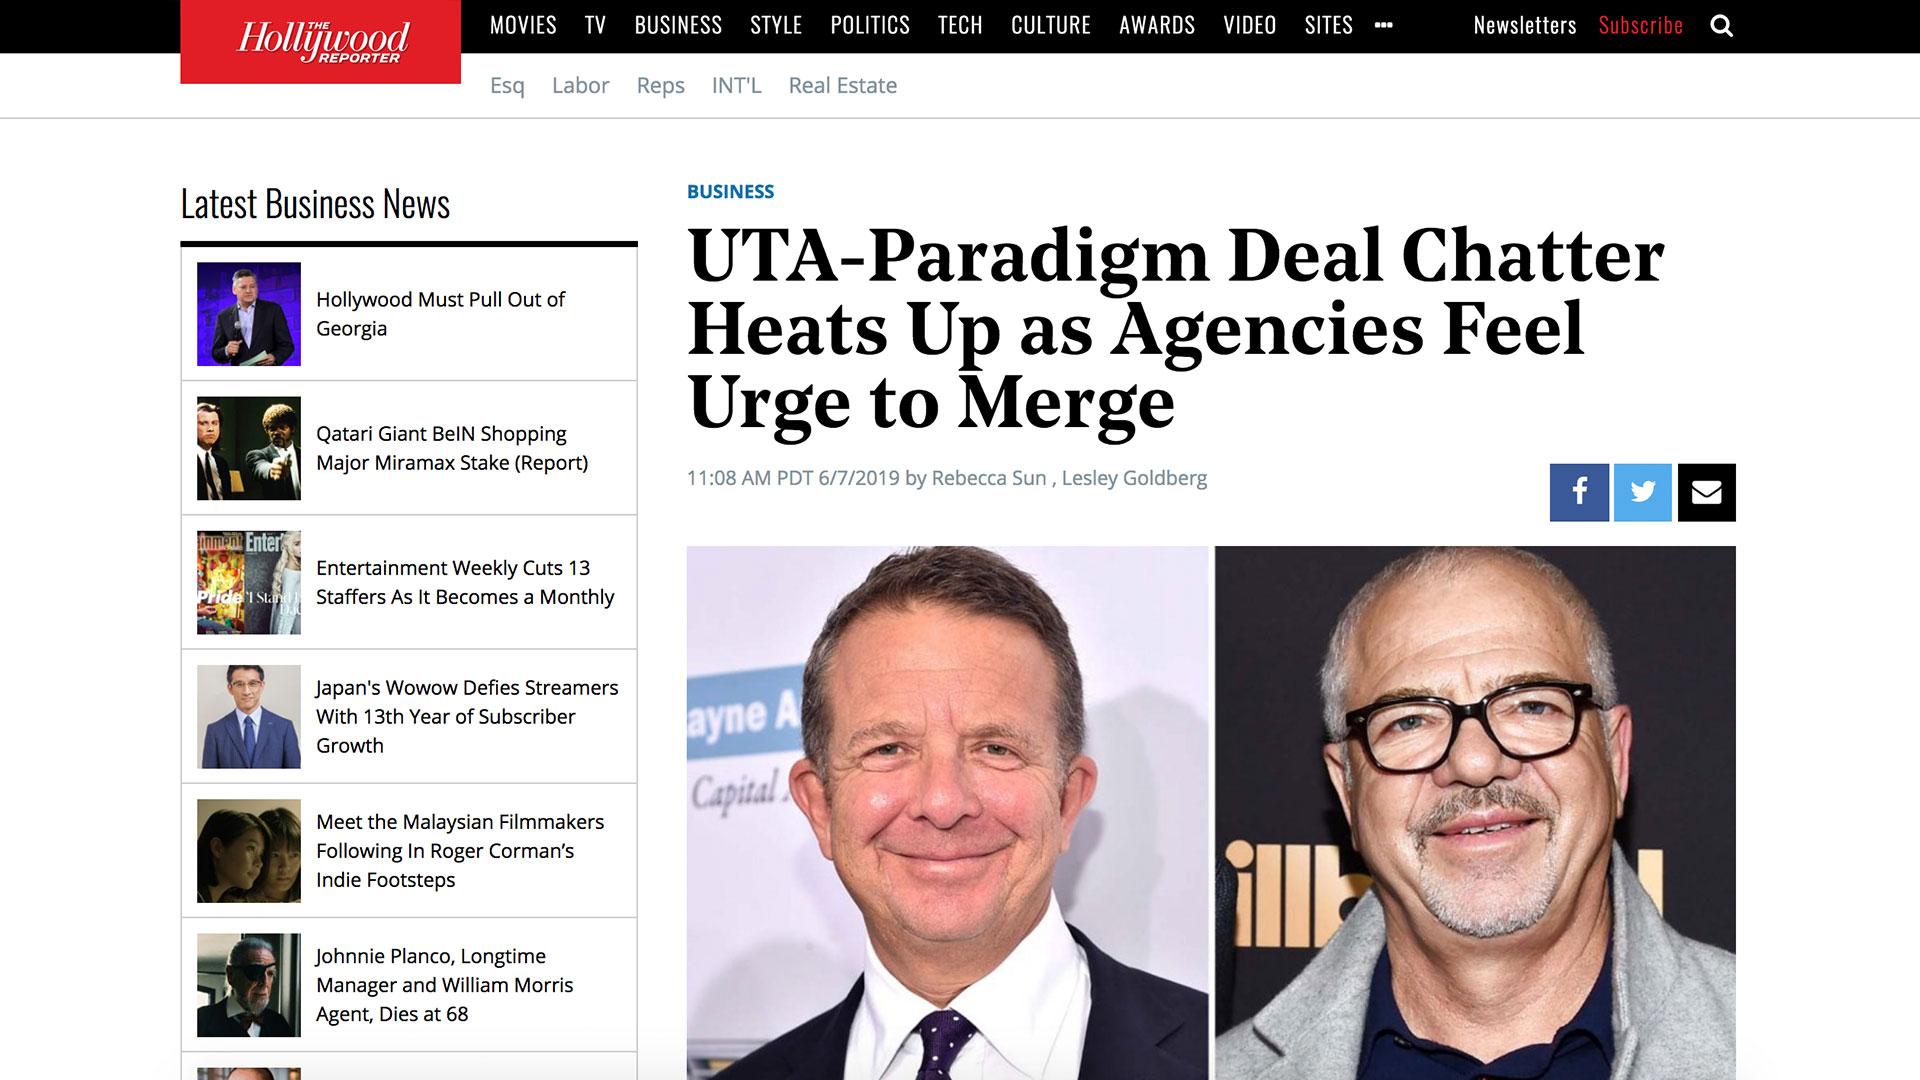 Fairness Rocks News UTA-Paradigm Deal Chatter Heats Up as Agencies Feel Urge to Merge